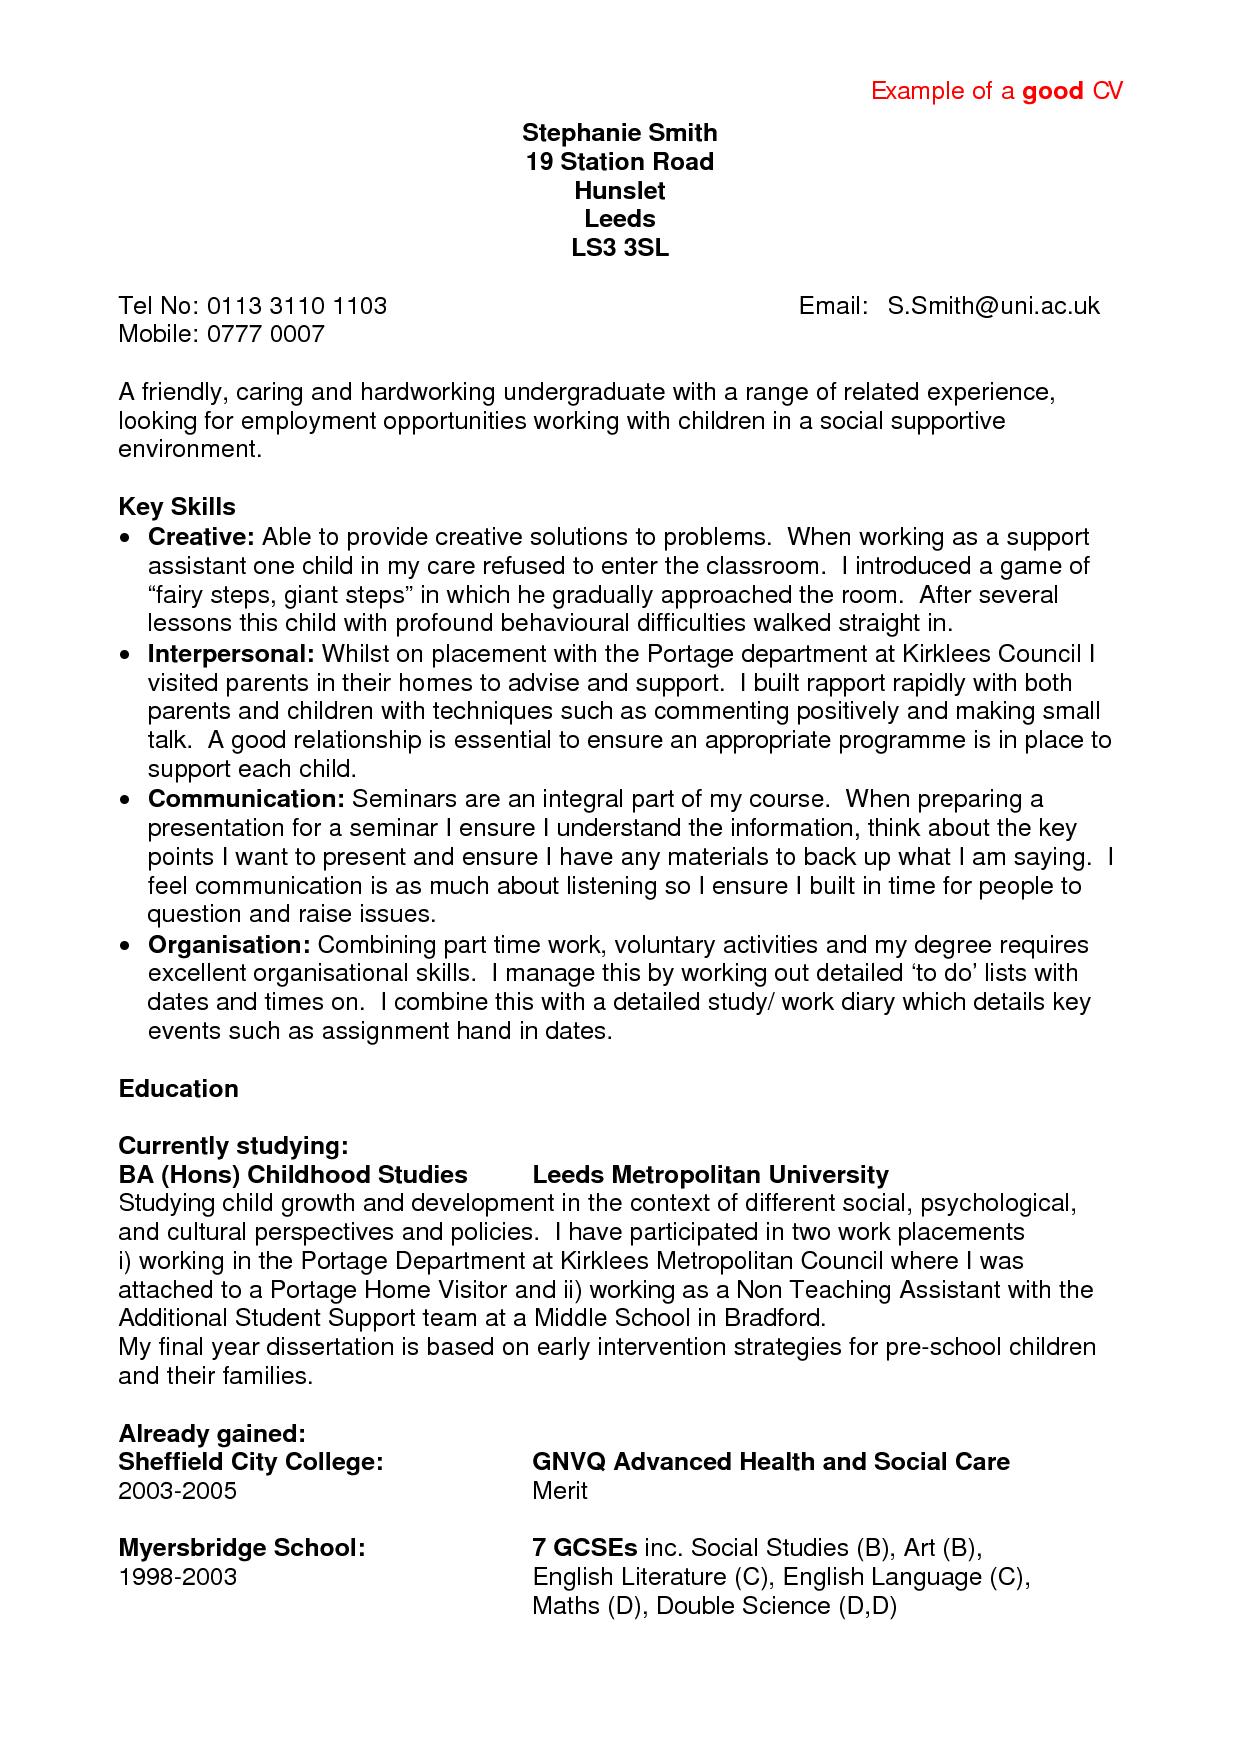 Resume Sample Format For Job Application